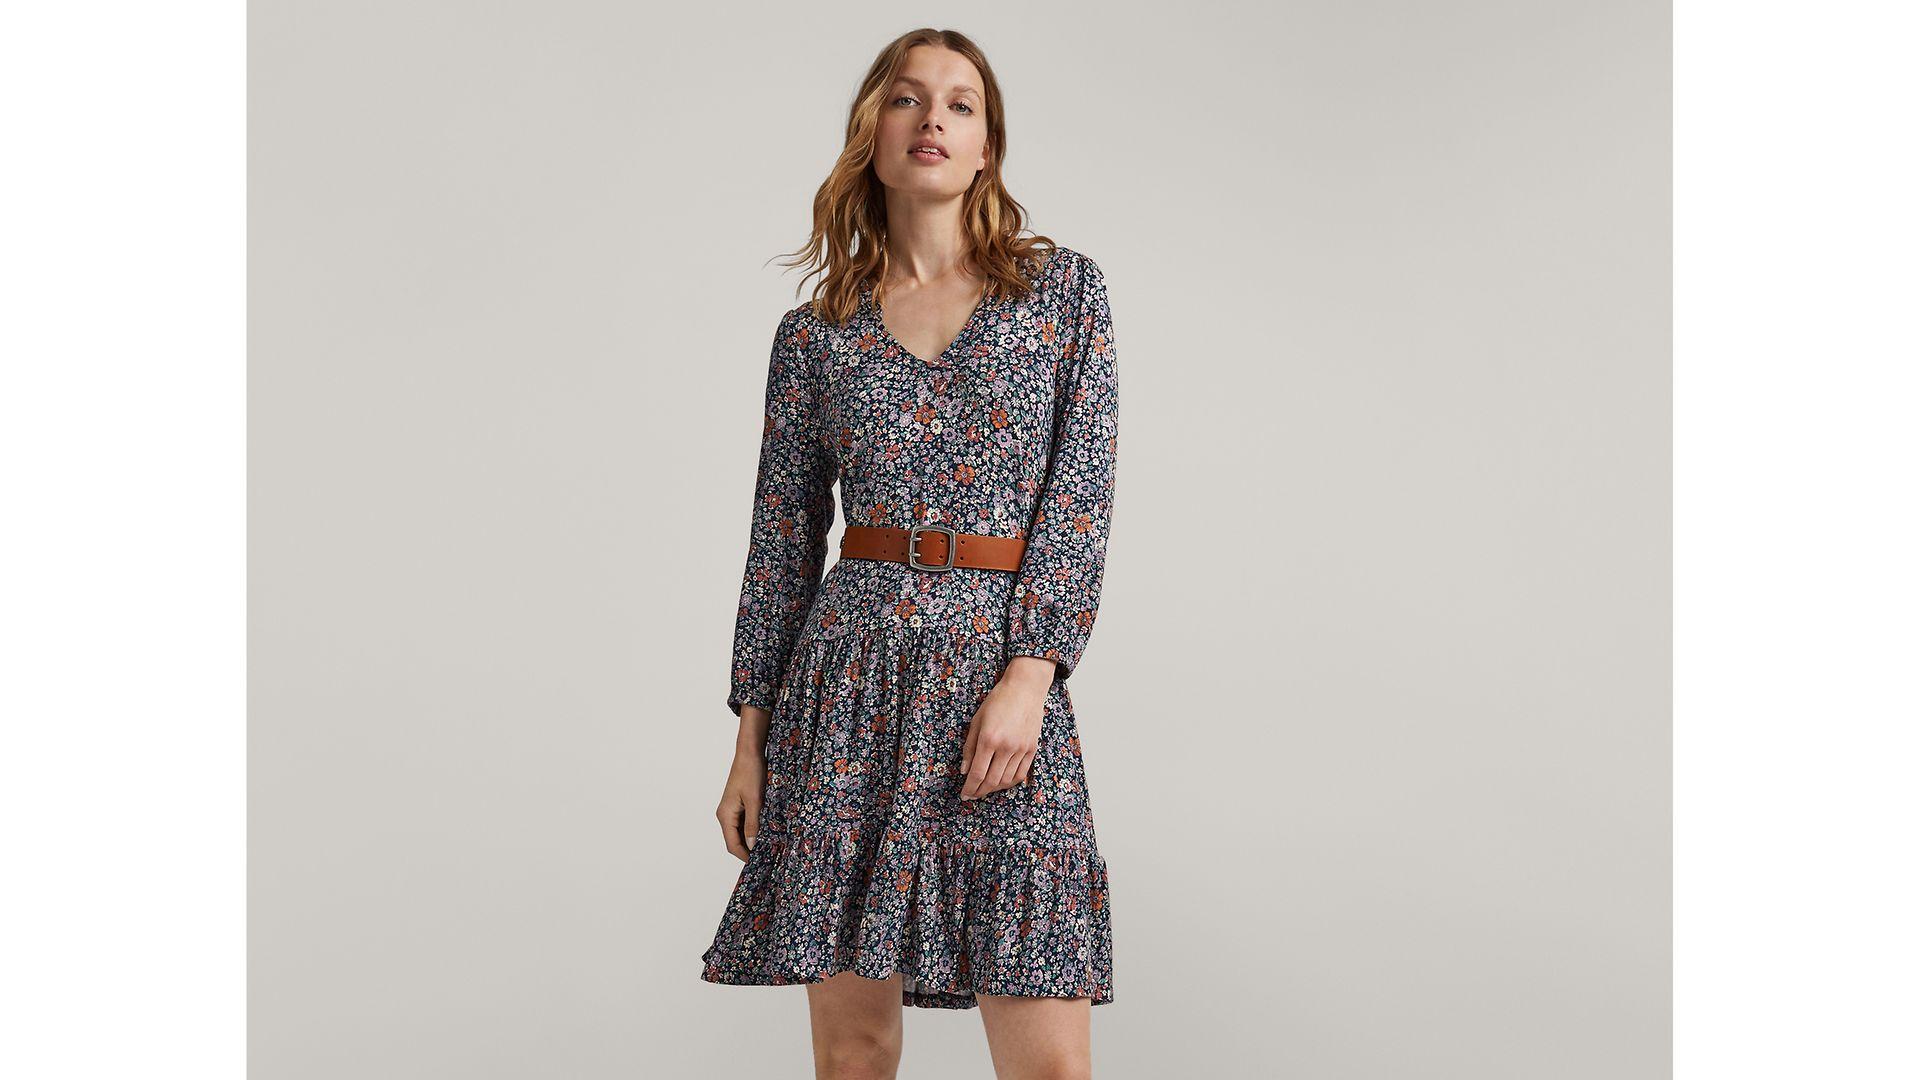 030721 - Women - Inspiration - Lookbook - Dressed up for Summer - Hero Large 2 - IMG